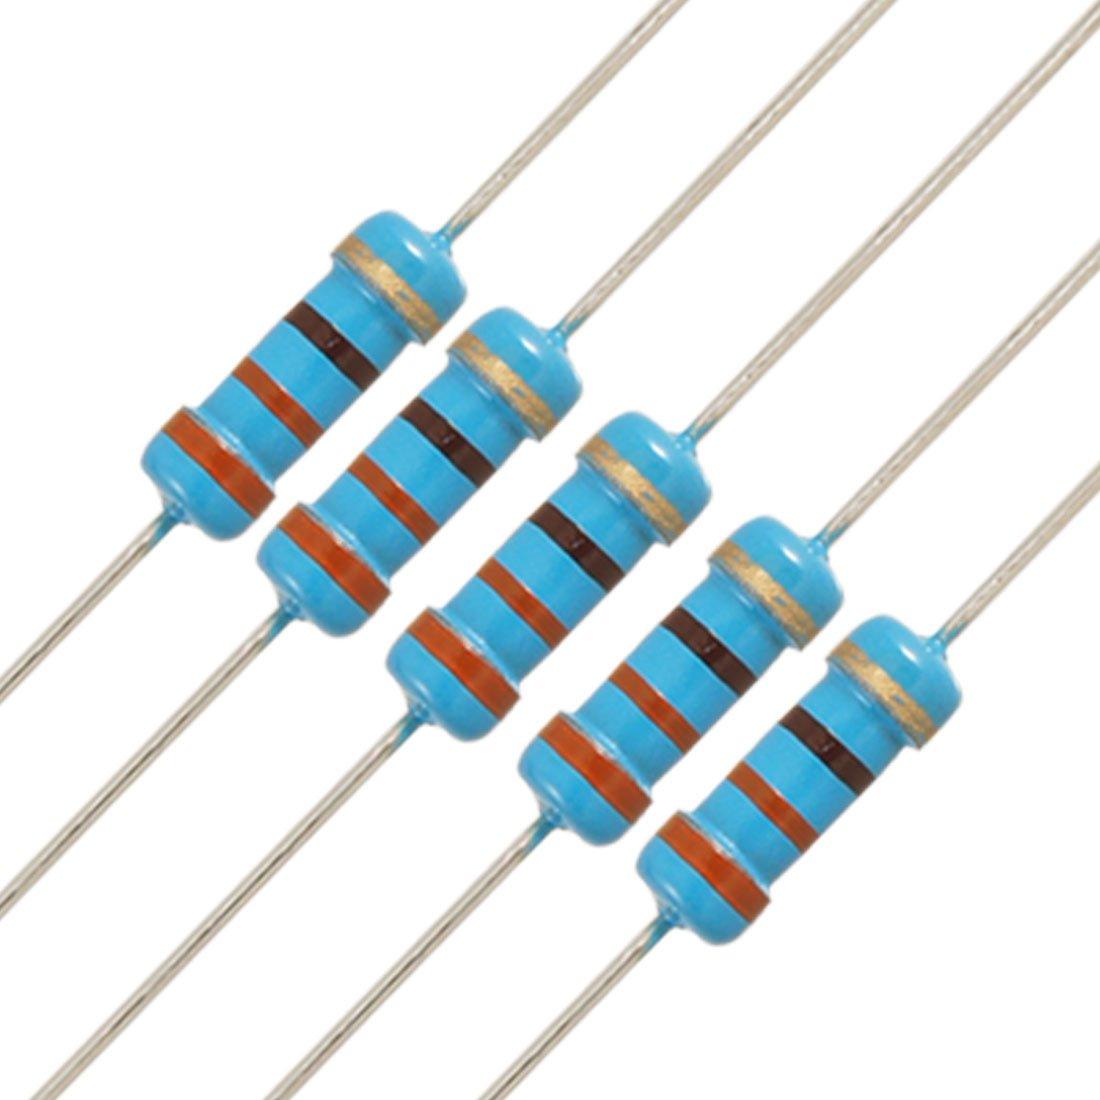 Uxcell a11102400ux0148 /Â 20 x 1//2W Watt 330 ohm 330R Carbon Film Resistor 0.5W